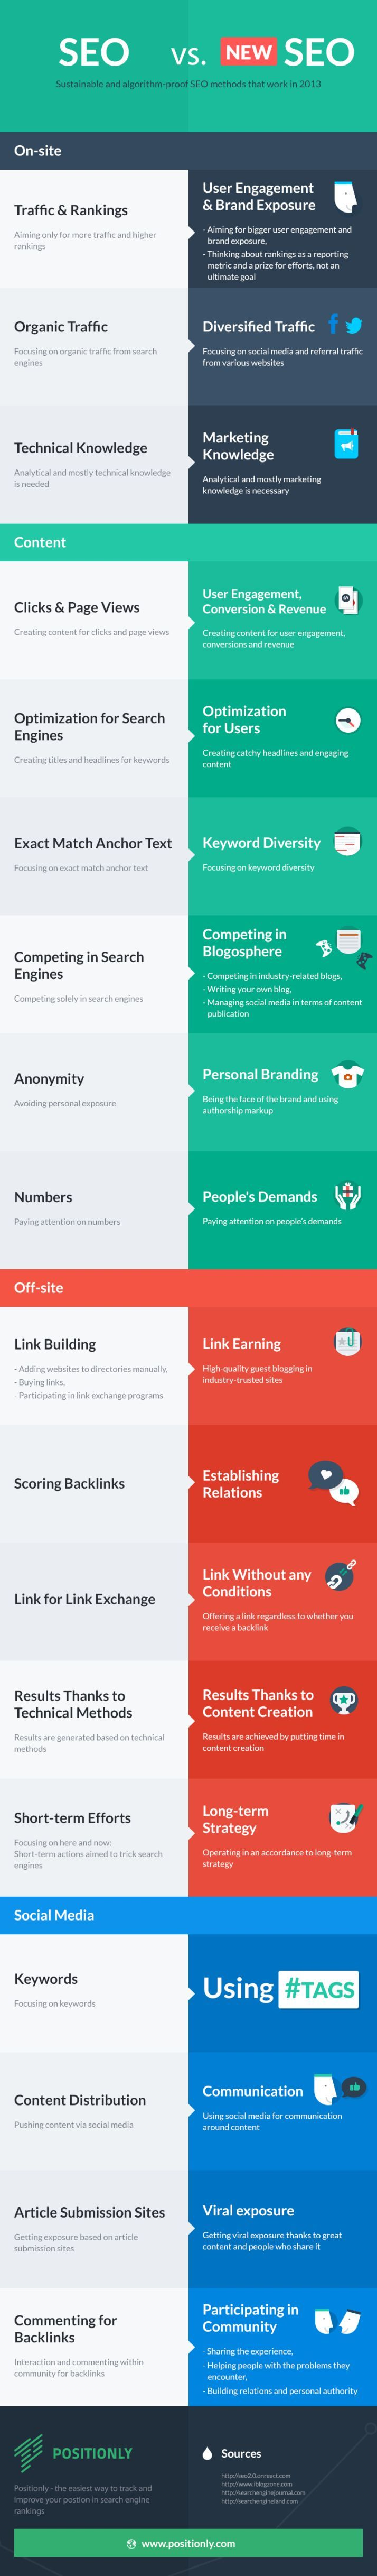 SEO vs. New SEO - Infographic